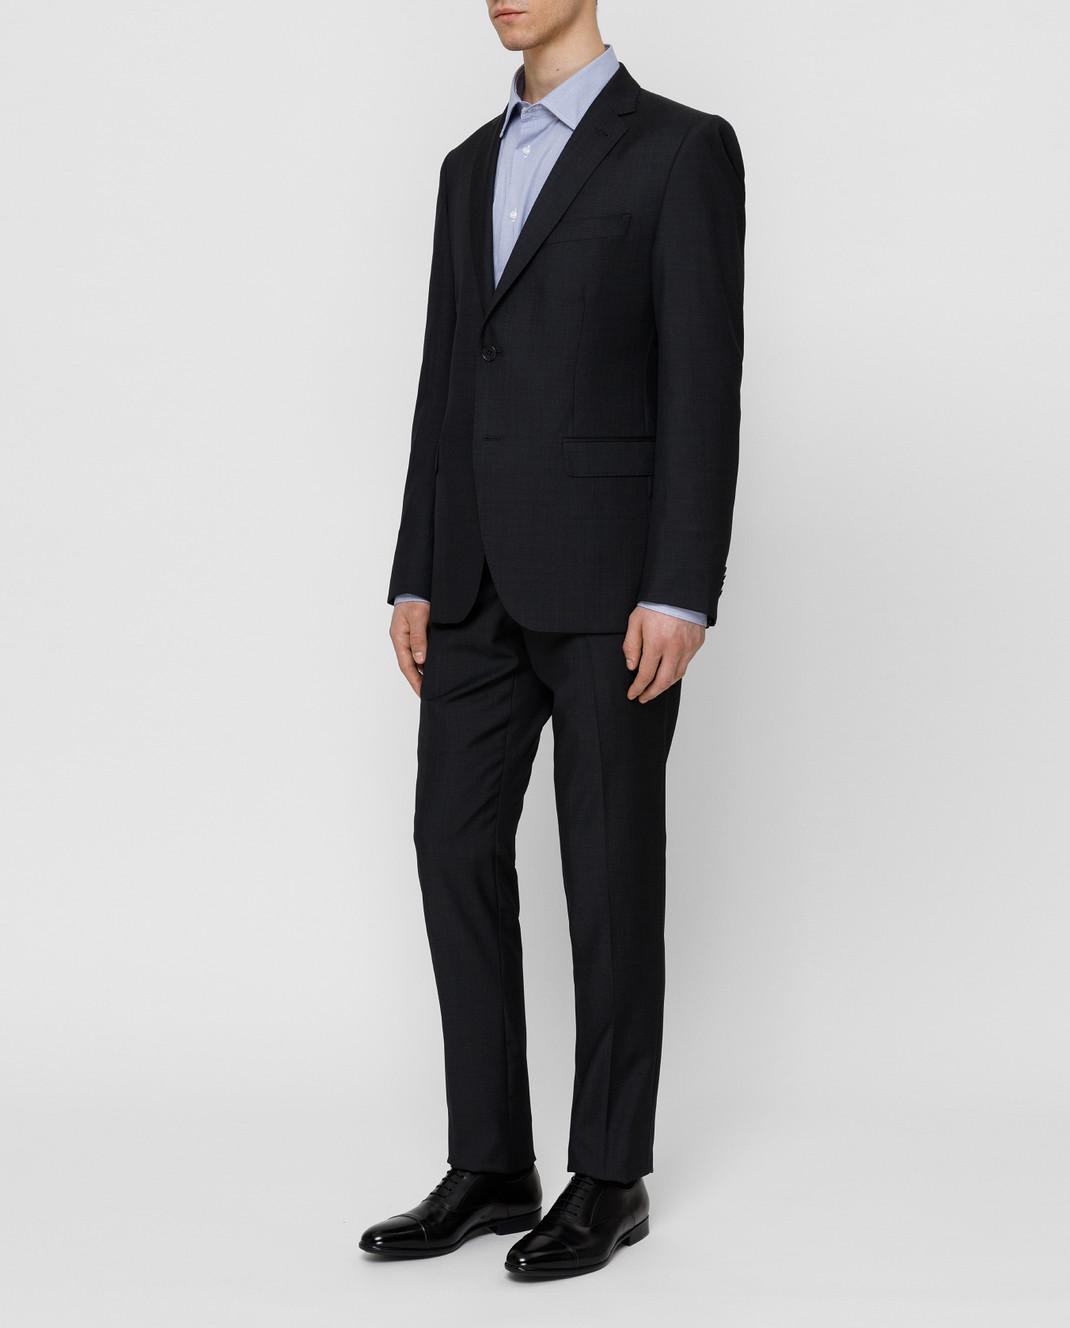 Fradi Тёмно-синий костюм 192AJ7025944 изображение 3